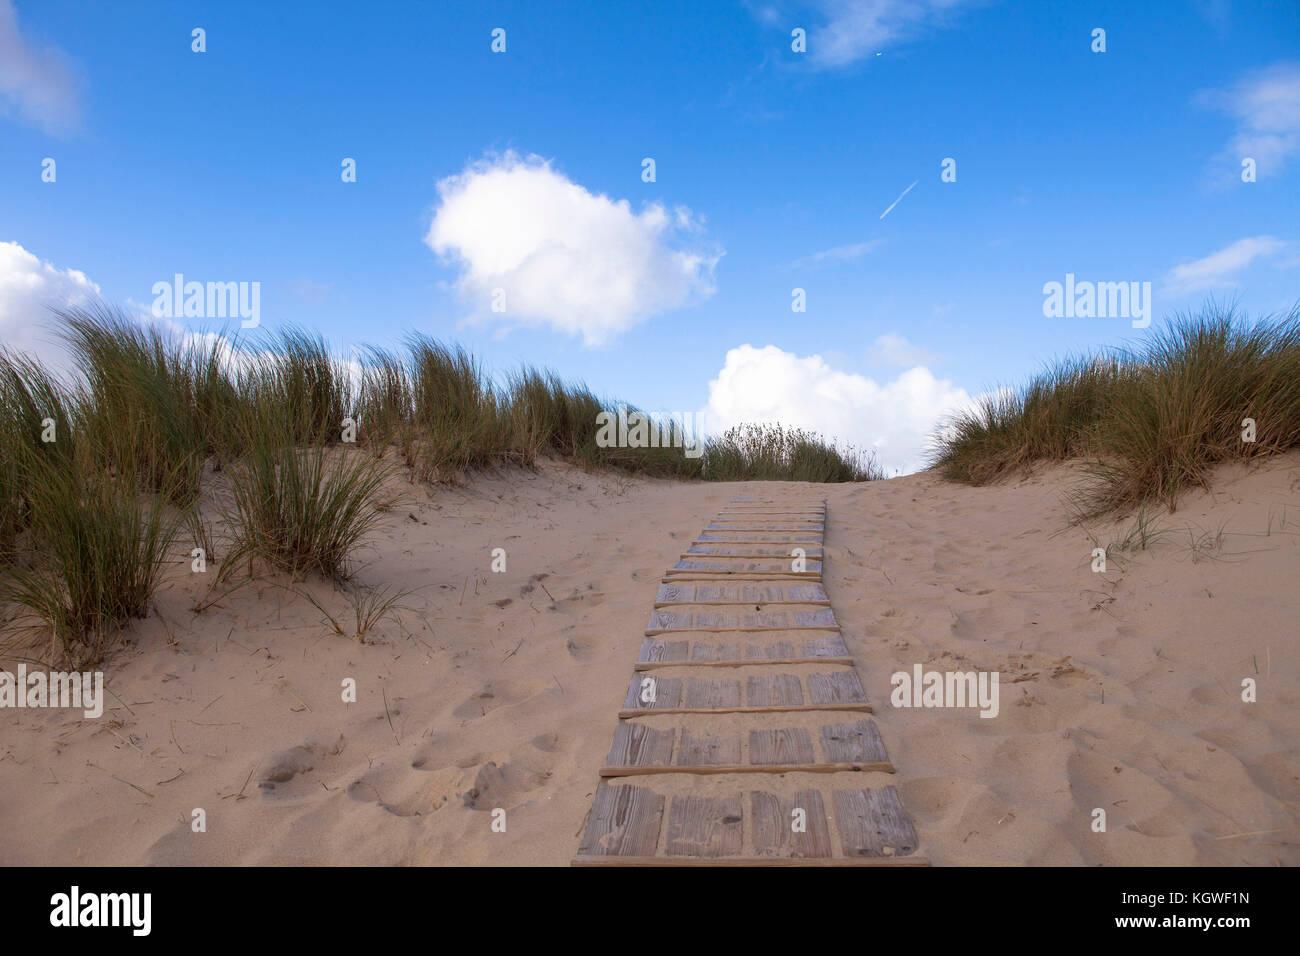 Netherlands, Zeeland, boardwalk through the dunes in the nature reserve de Manteling between Domburg and Oostkapelle Stock Photo